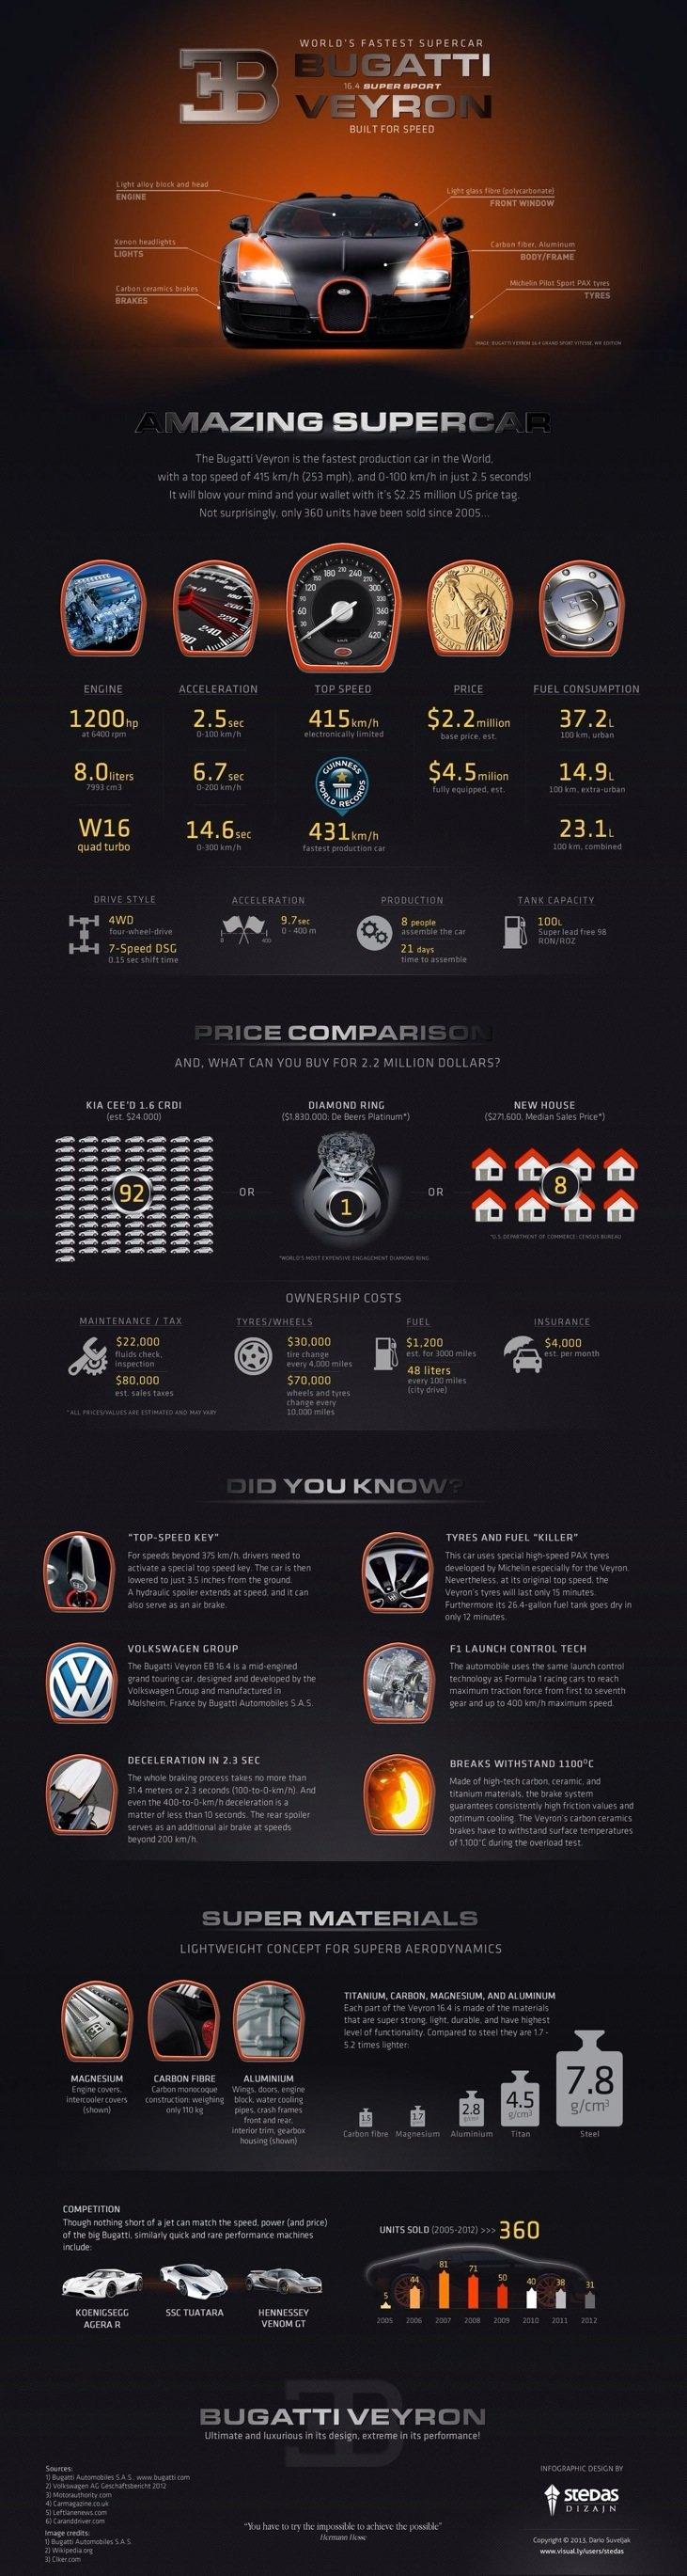 World's Fastest Super Car Bugatti Veyron - Infographic